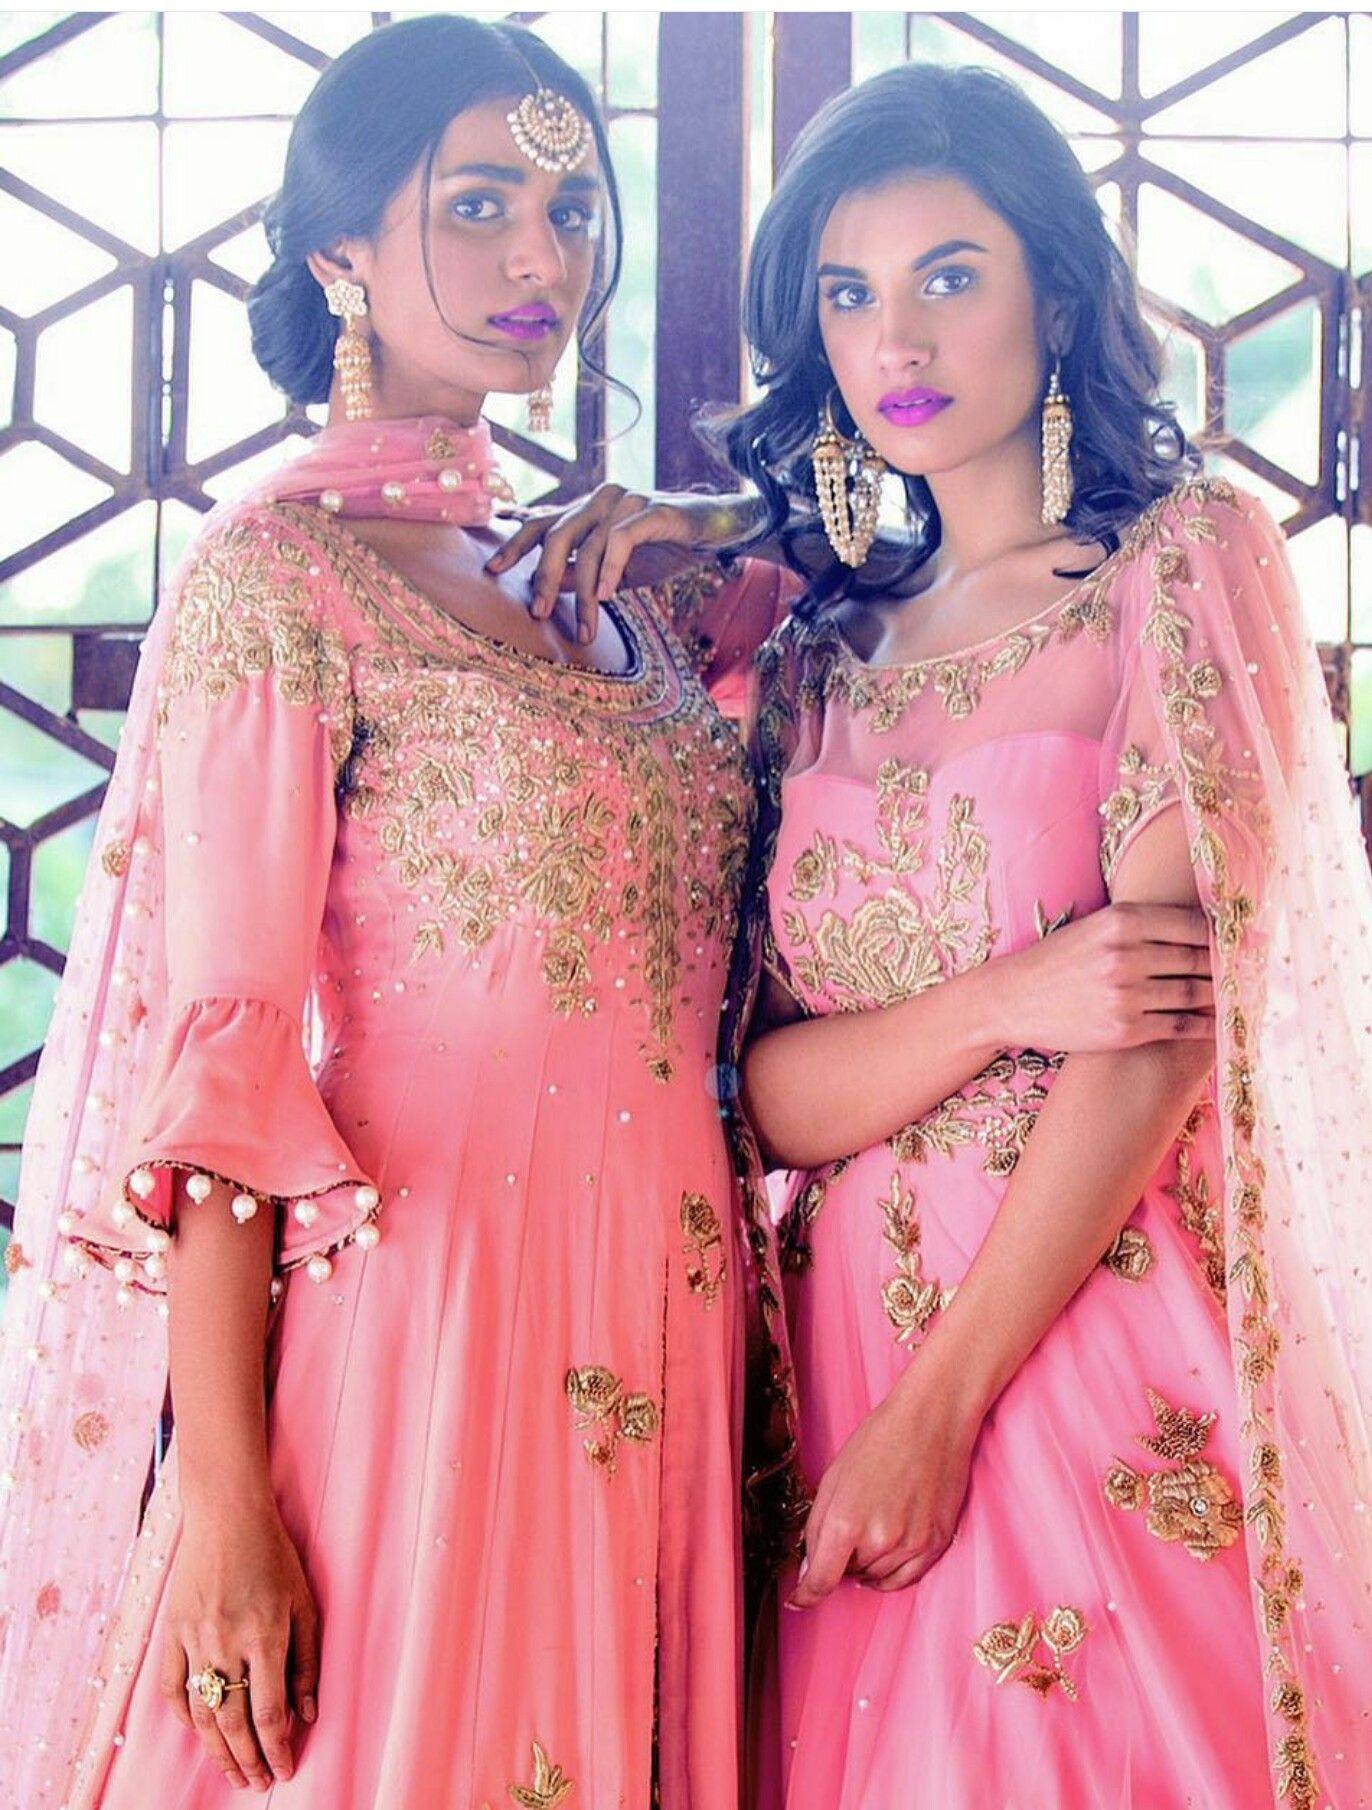 Pin de Aditi S en Indian outfits | Pinterest